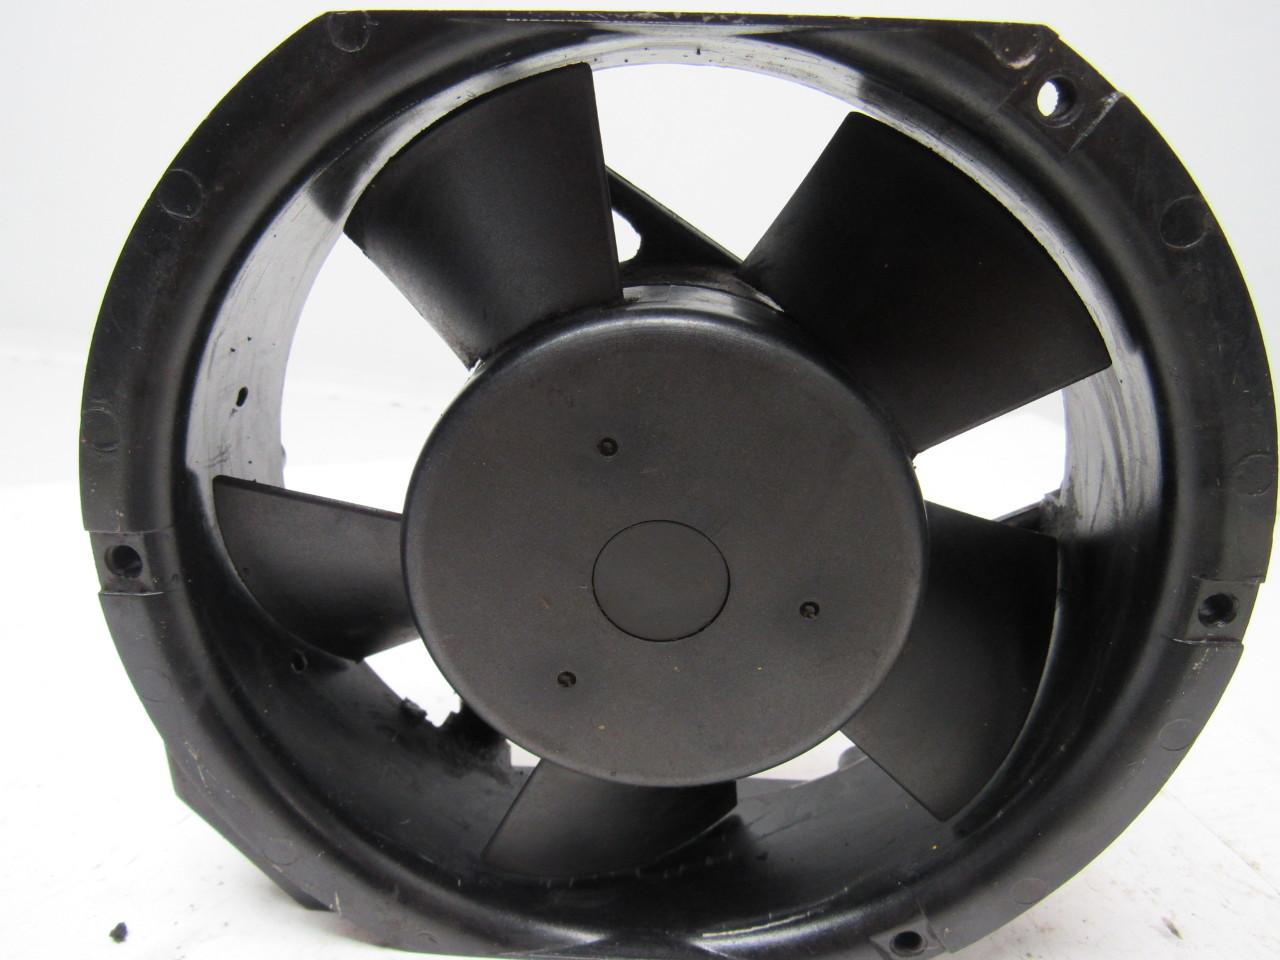 Dayton Axial Fans : Dayton wt a axial fan vac rpm cfm ebay